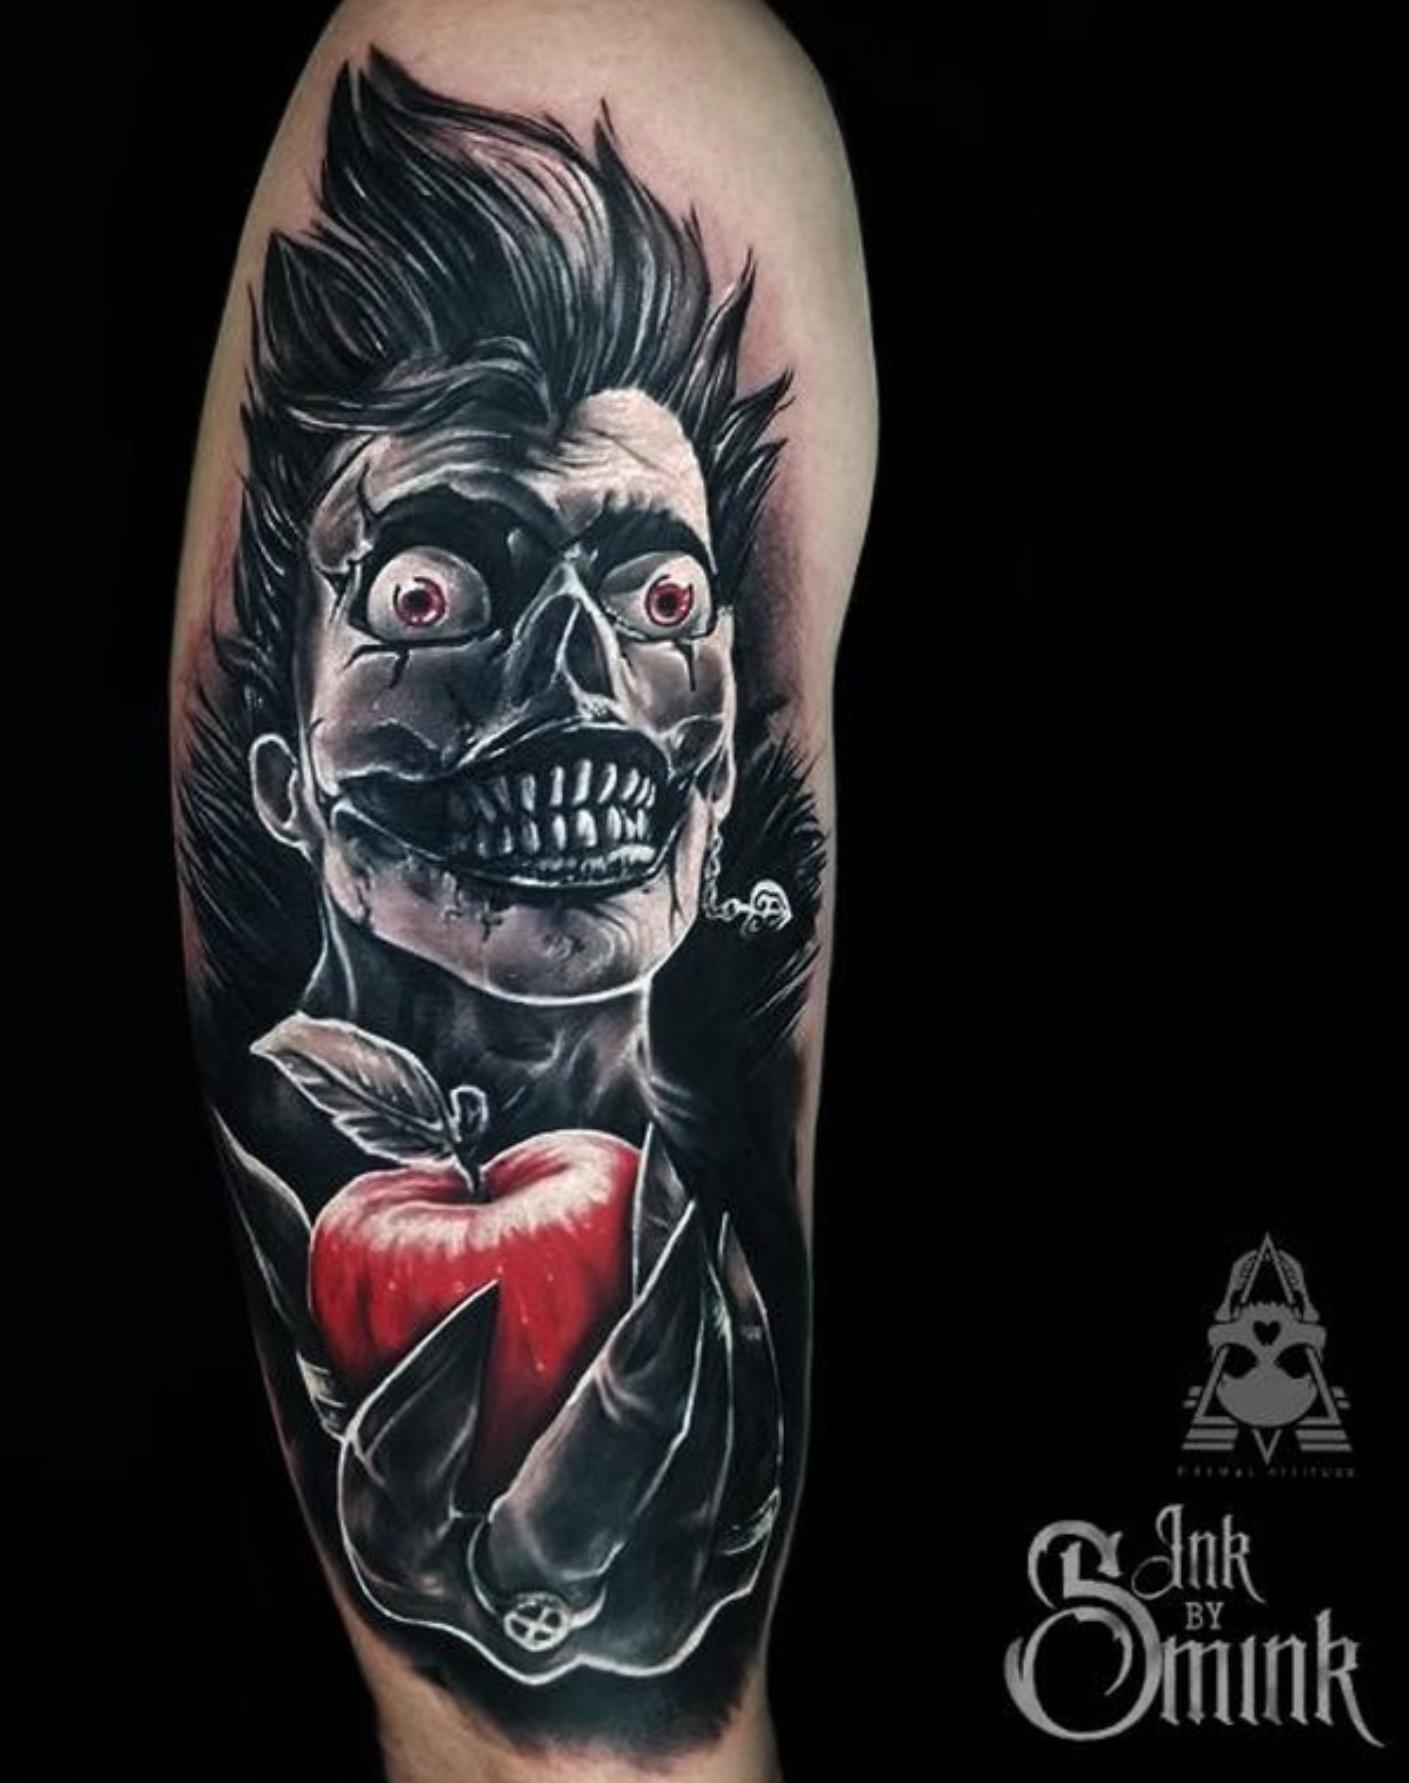 Ryuk Done By Will Smink True Love Tattoo In London Ontario Tattoos Skull Girl Tattoo True Love Tattoo